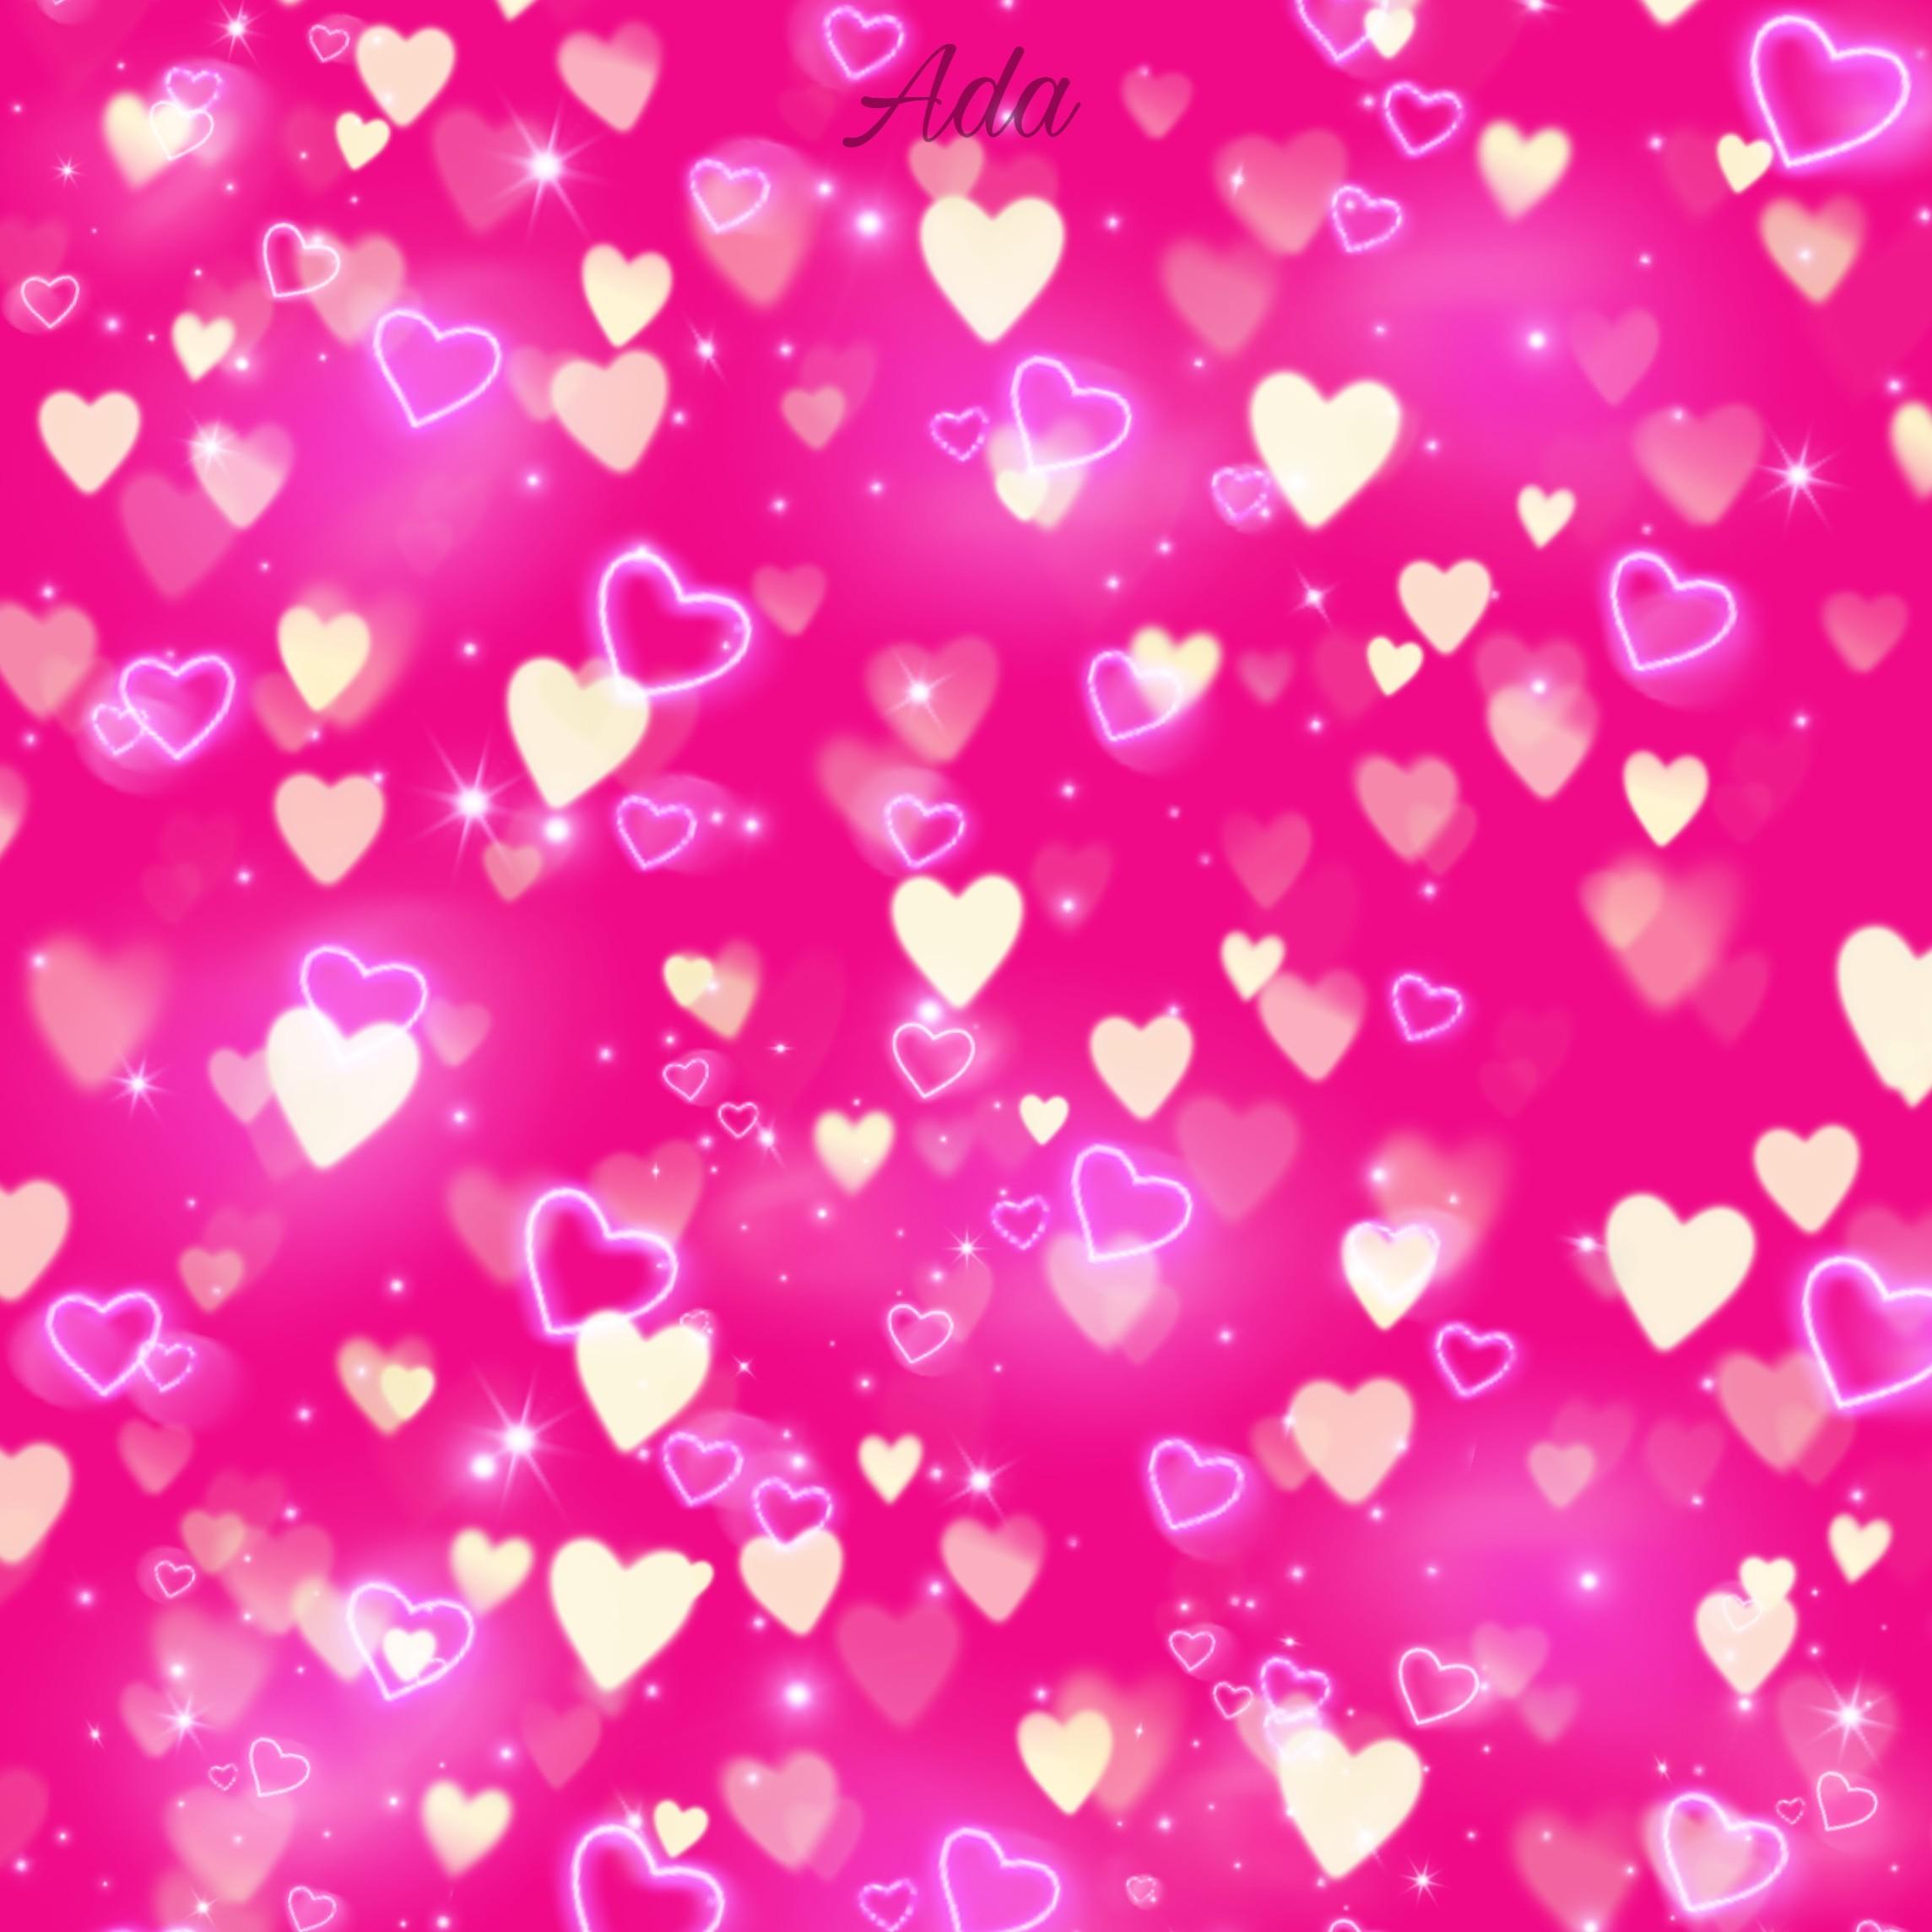 Remix it..!#madebyme#mybackground#background#pink #freetoedit #aesthetic#heart#remixit